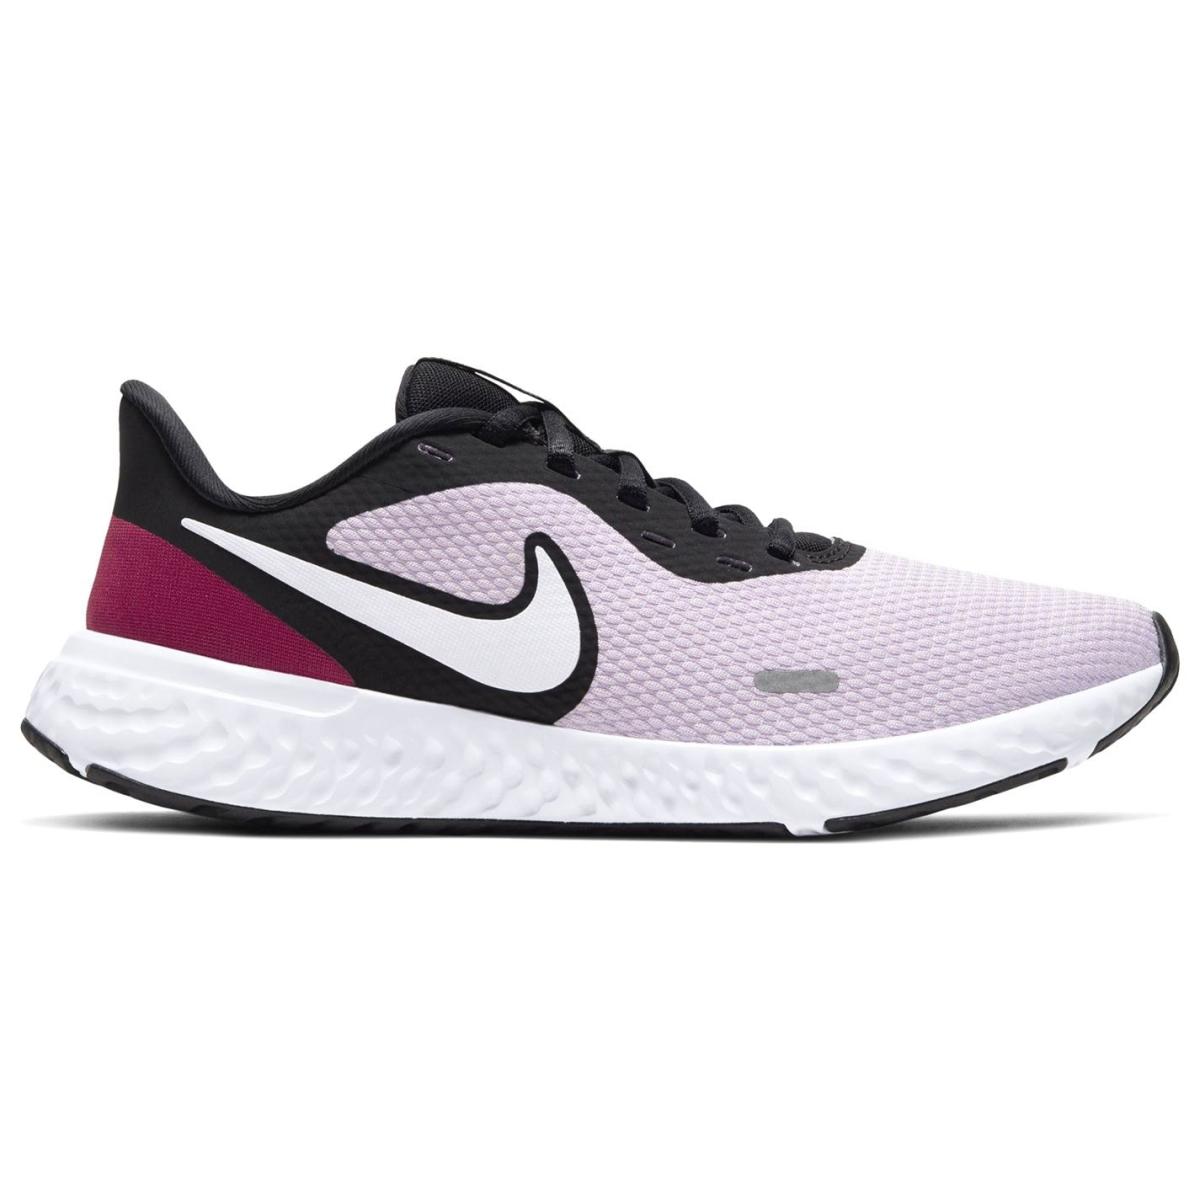 Nike-Revolution-Turnschuhe-Damen-Sneaker-Sportschuhe-Laufschuhe-1160 Indexbild 38